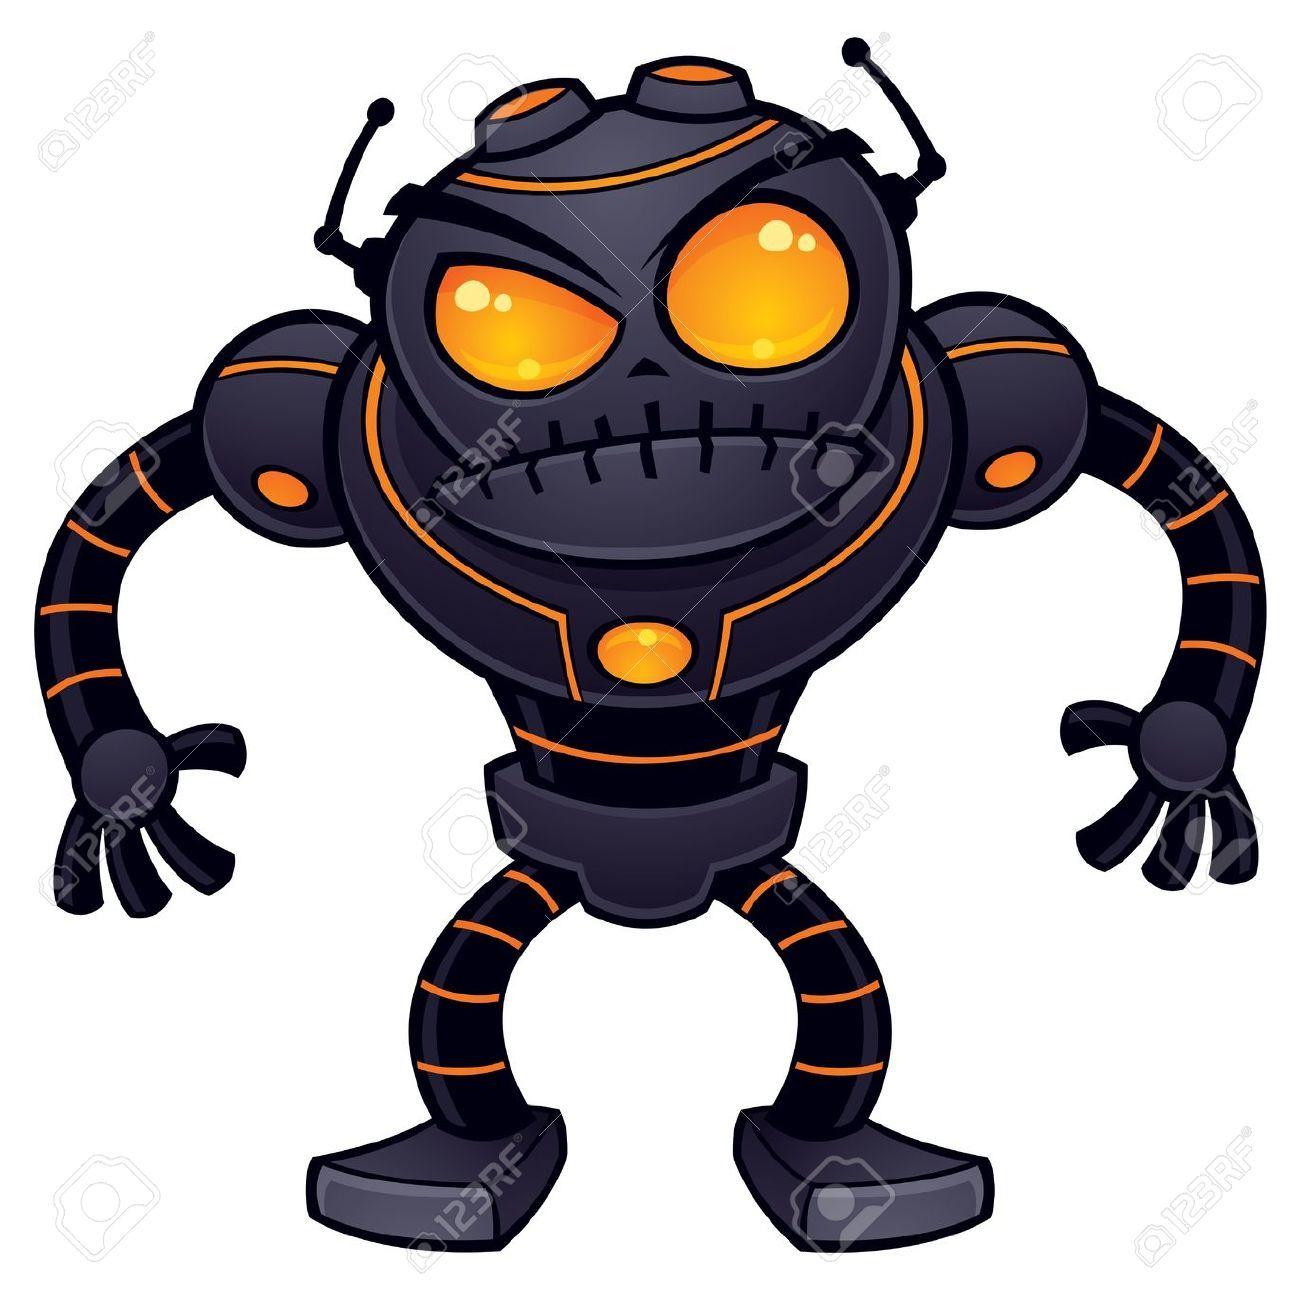 Cartoon Characters As Robots : Image result for robot eyes cartoon cartoons pinterest